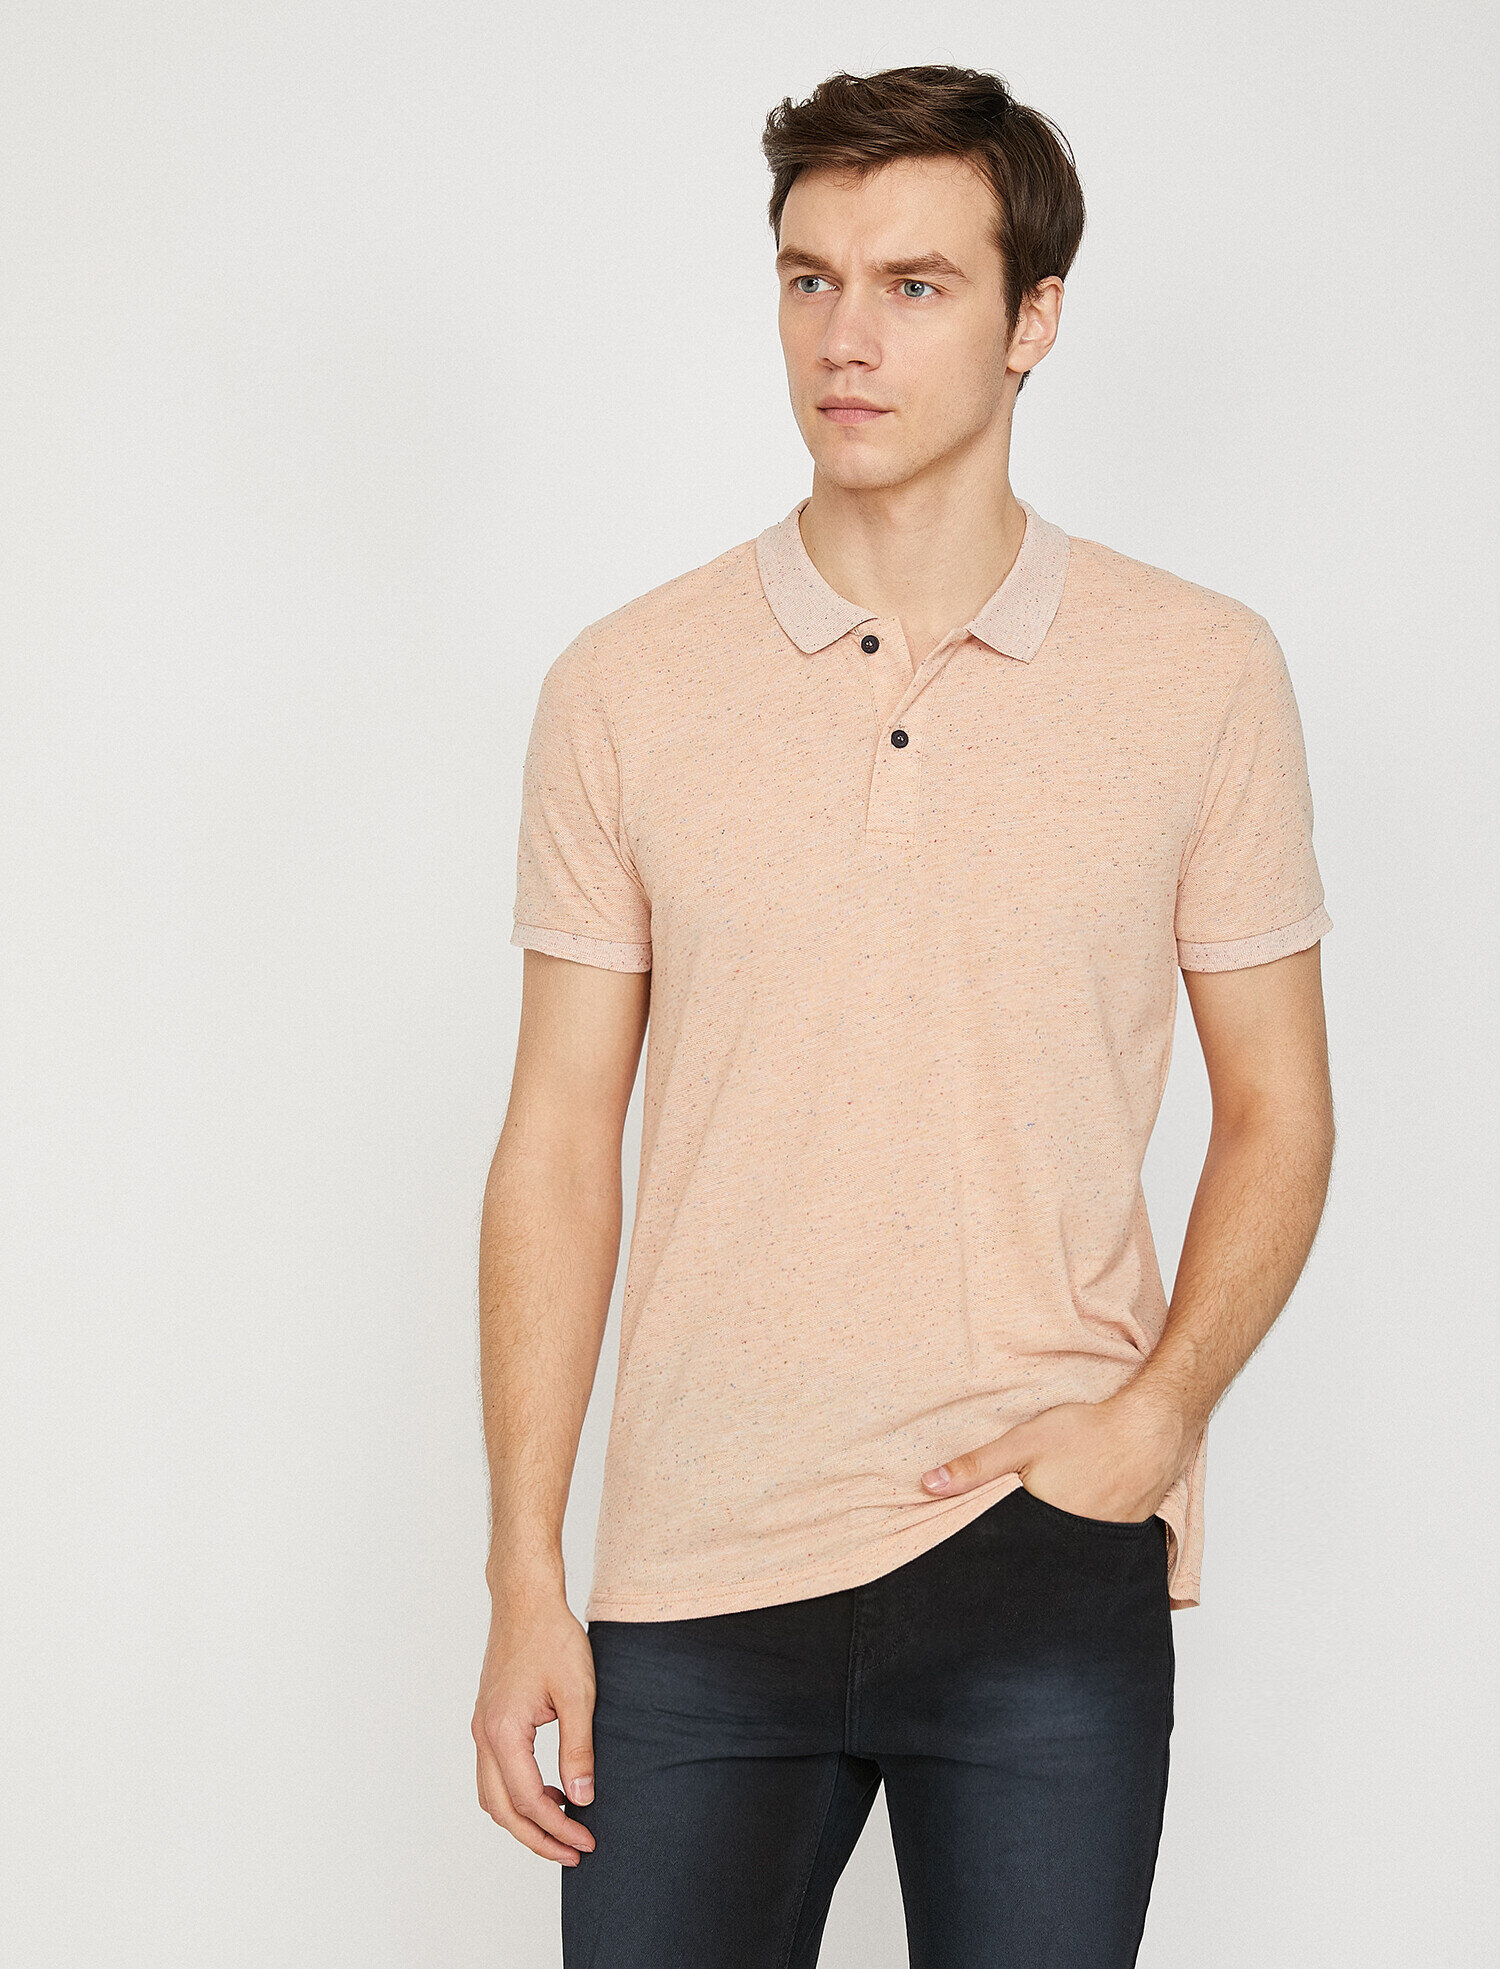 Koton Erkek Polo Yaka T-Shirt Pembe Ürün Resmi